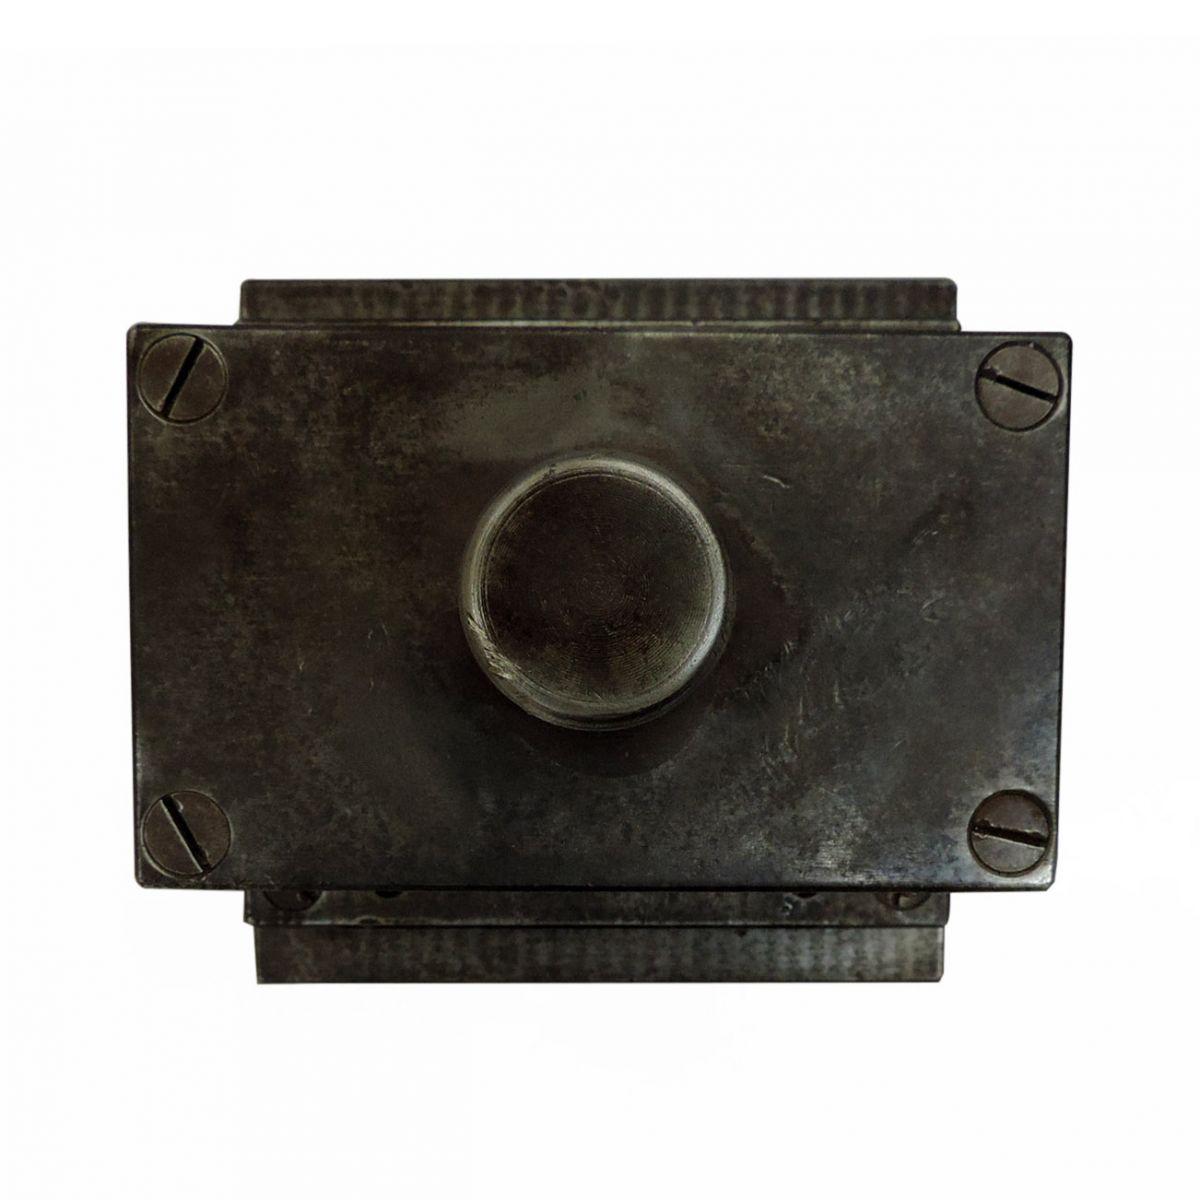 Estampo Prensa Excêntrica Hidráulica Estamparia ST17  - Usado